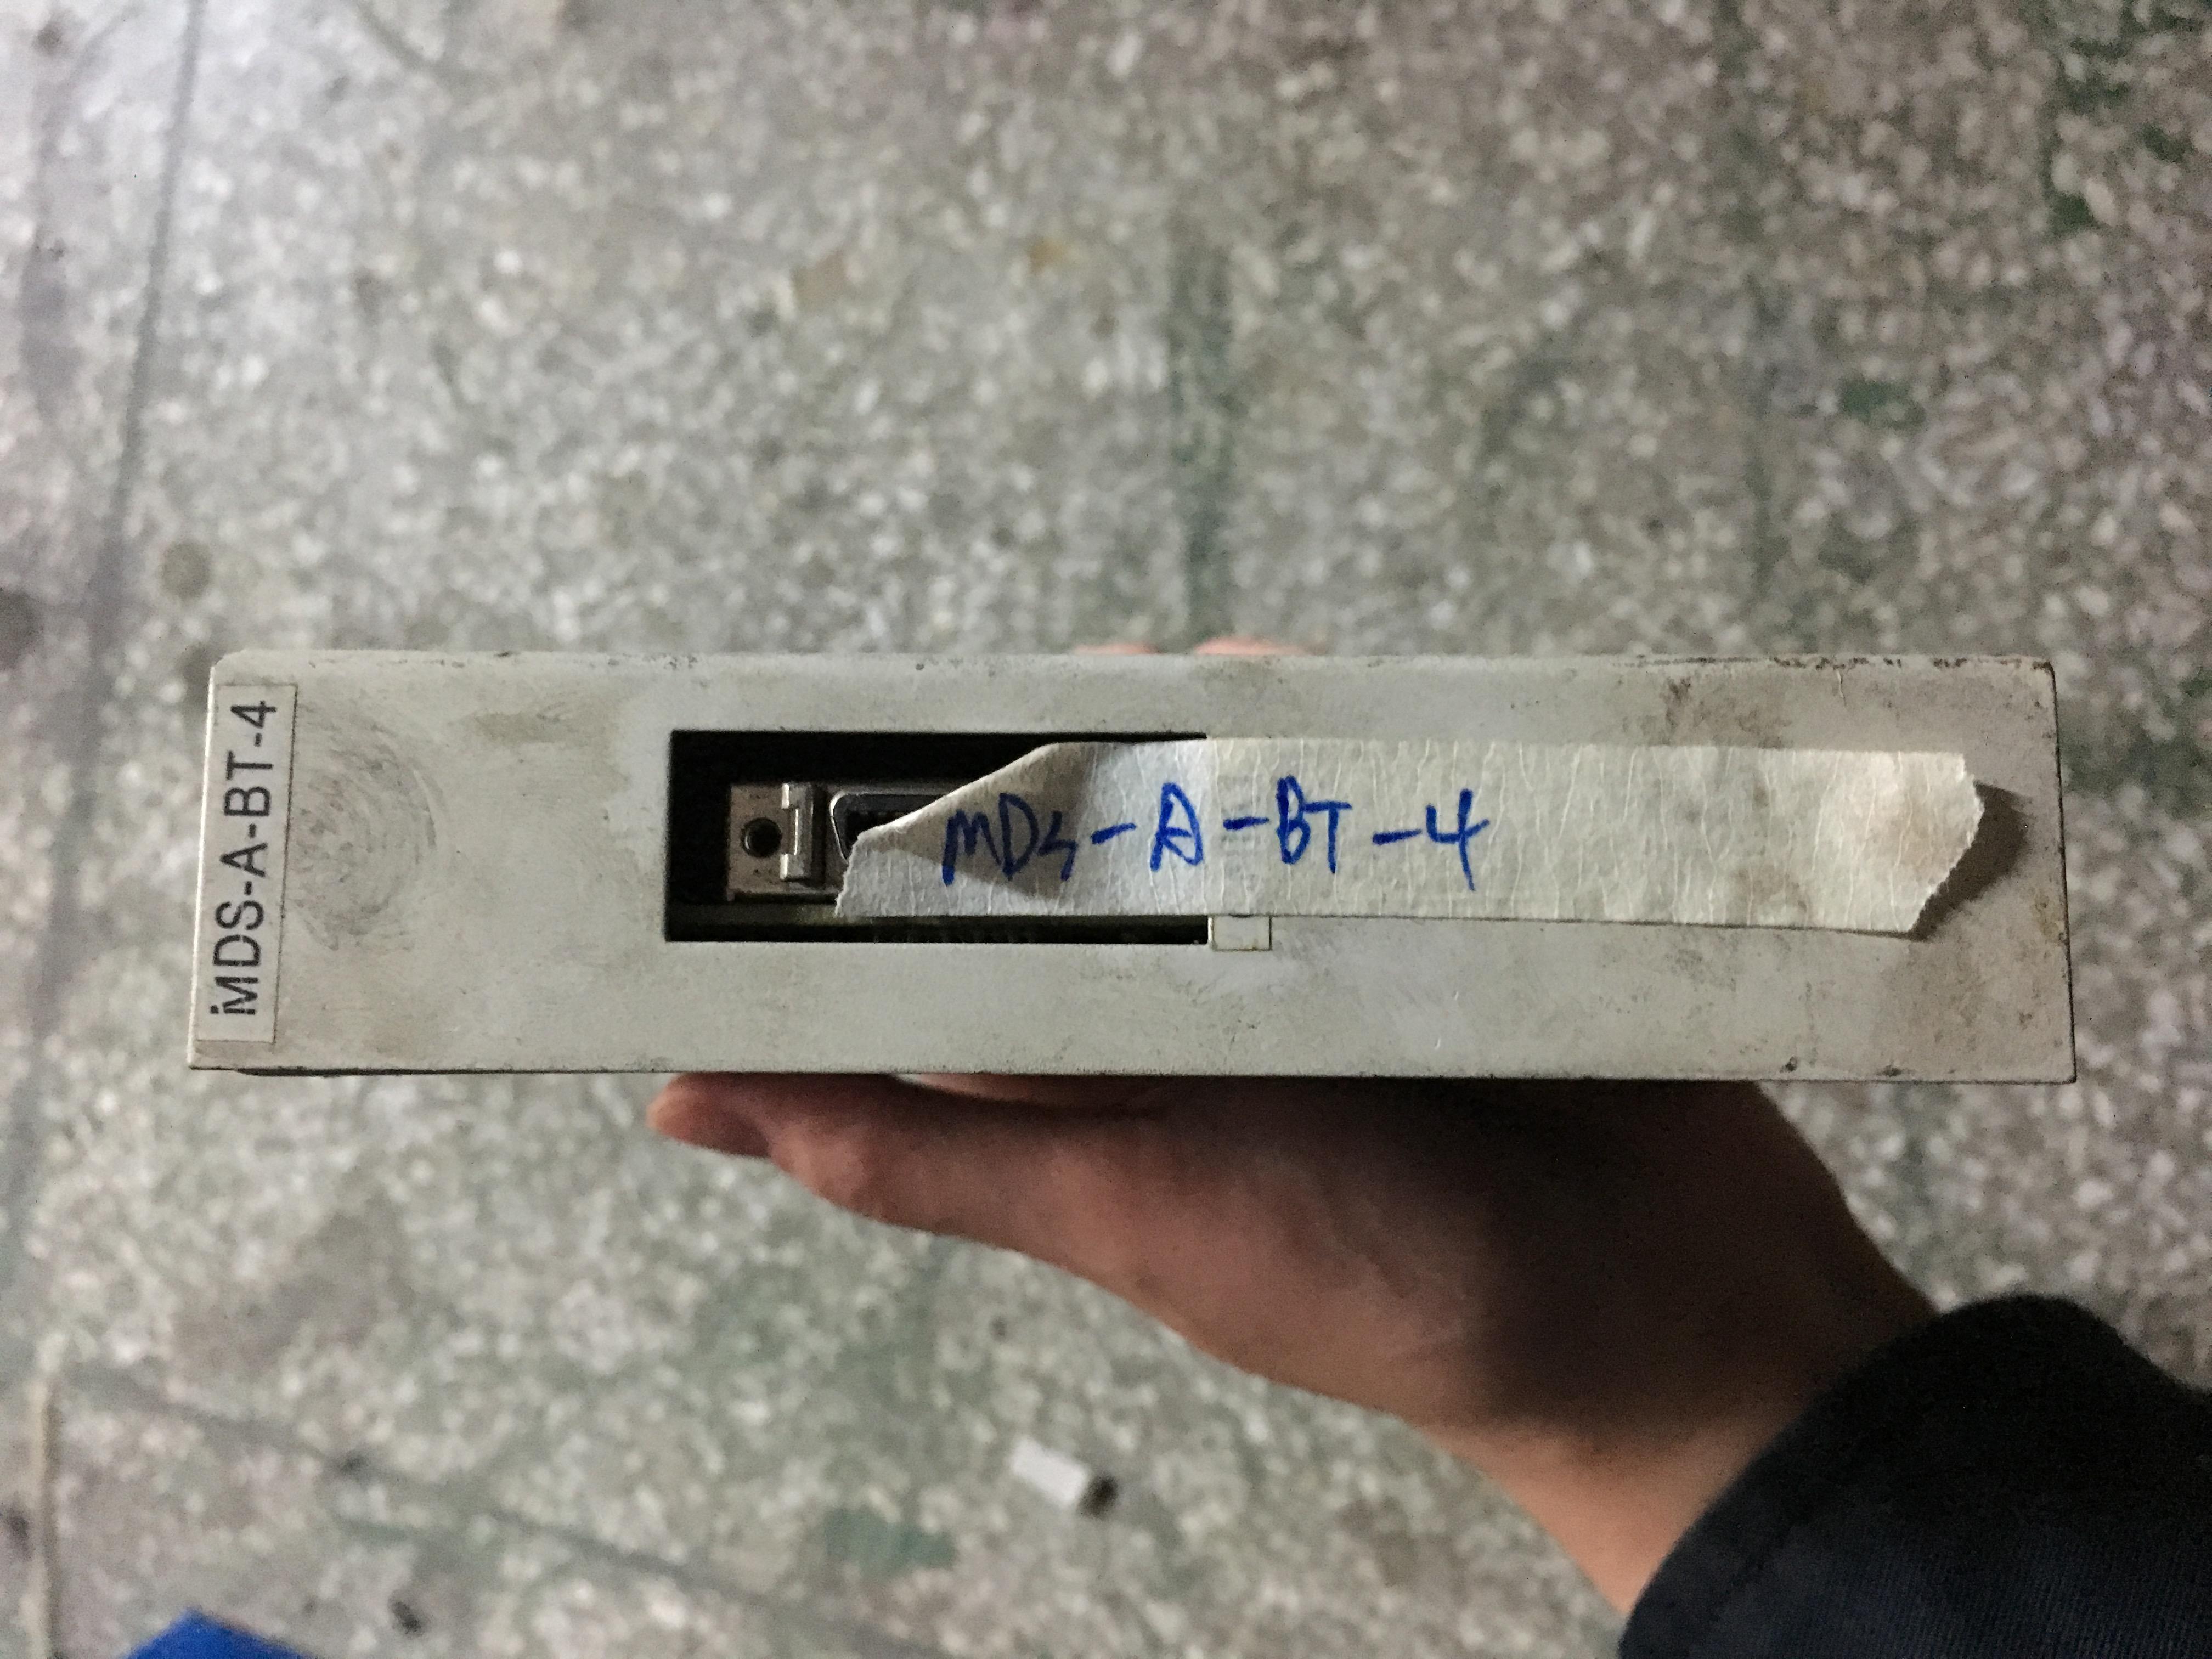 Mitsubishi battery unit MDS-A-BT-4 Japan Mitsubishi